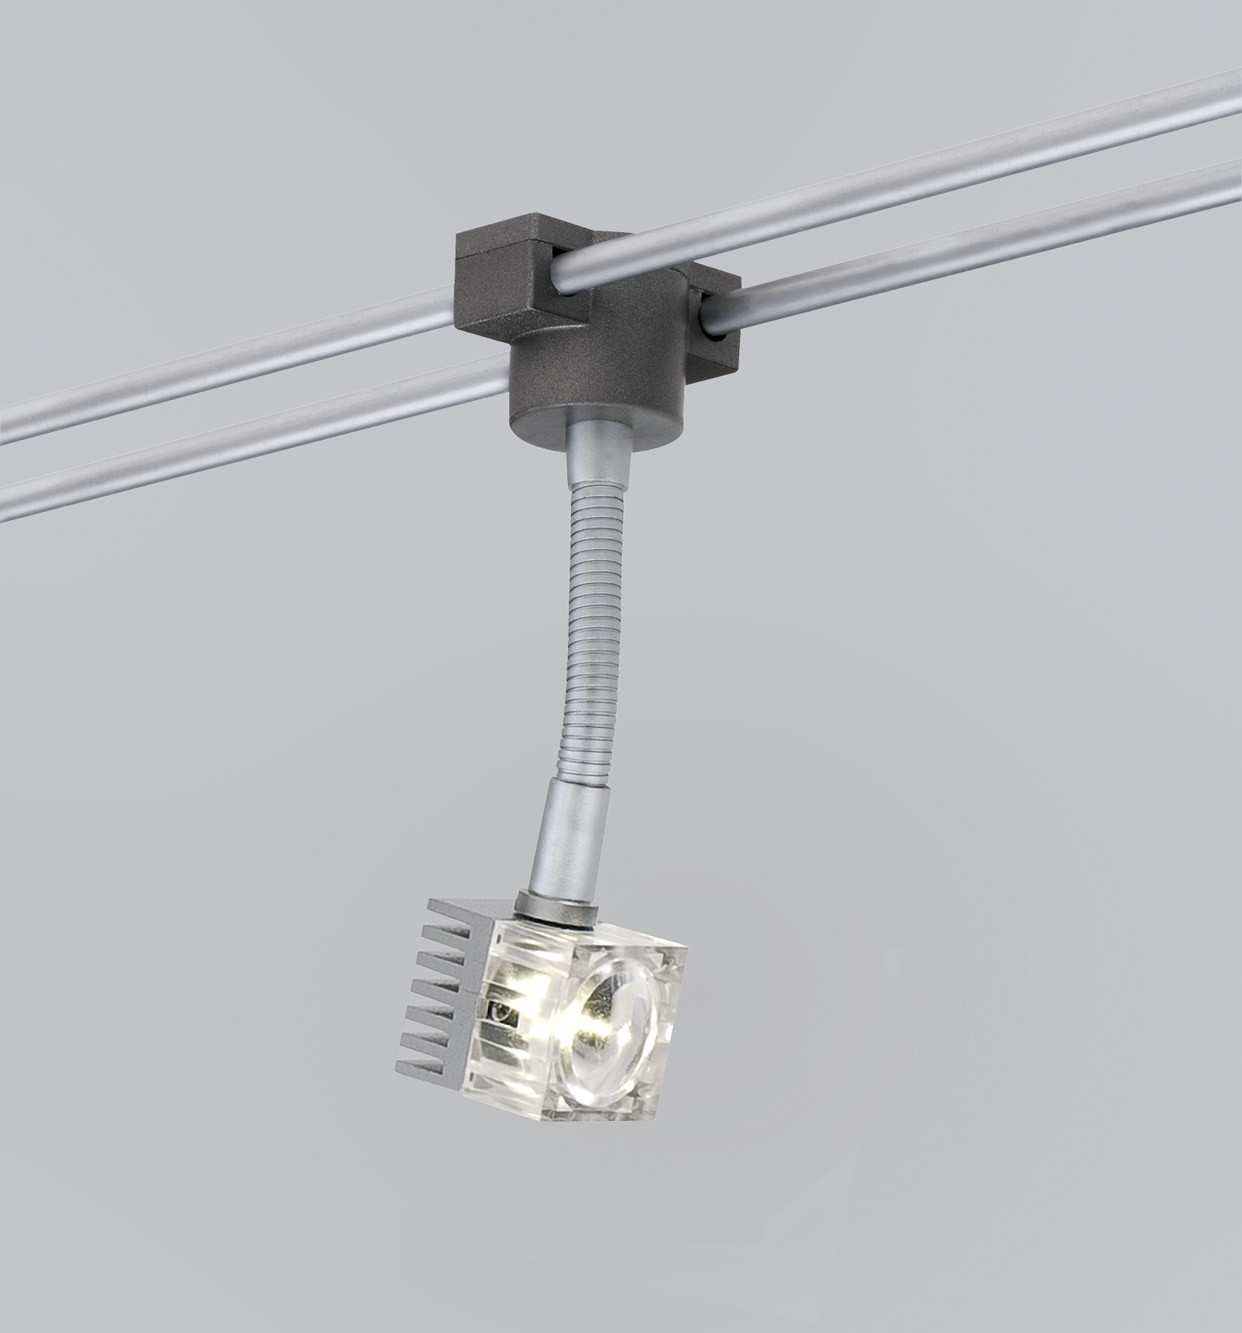 paulmann led rail schienensystem geo q flex chrom matt 5x3w 12v lampe ebay. Black Bedroom Furniture Sets. Home Design Ideas